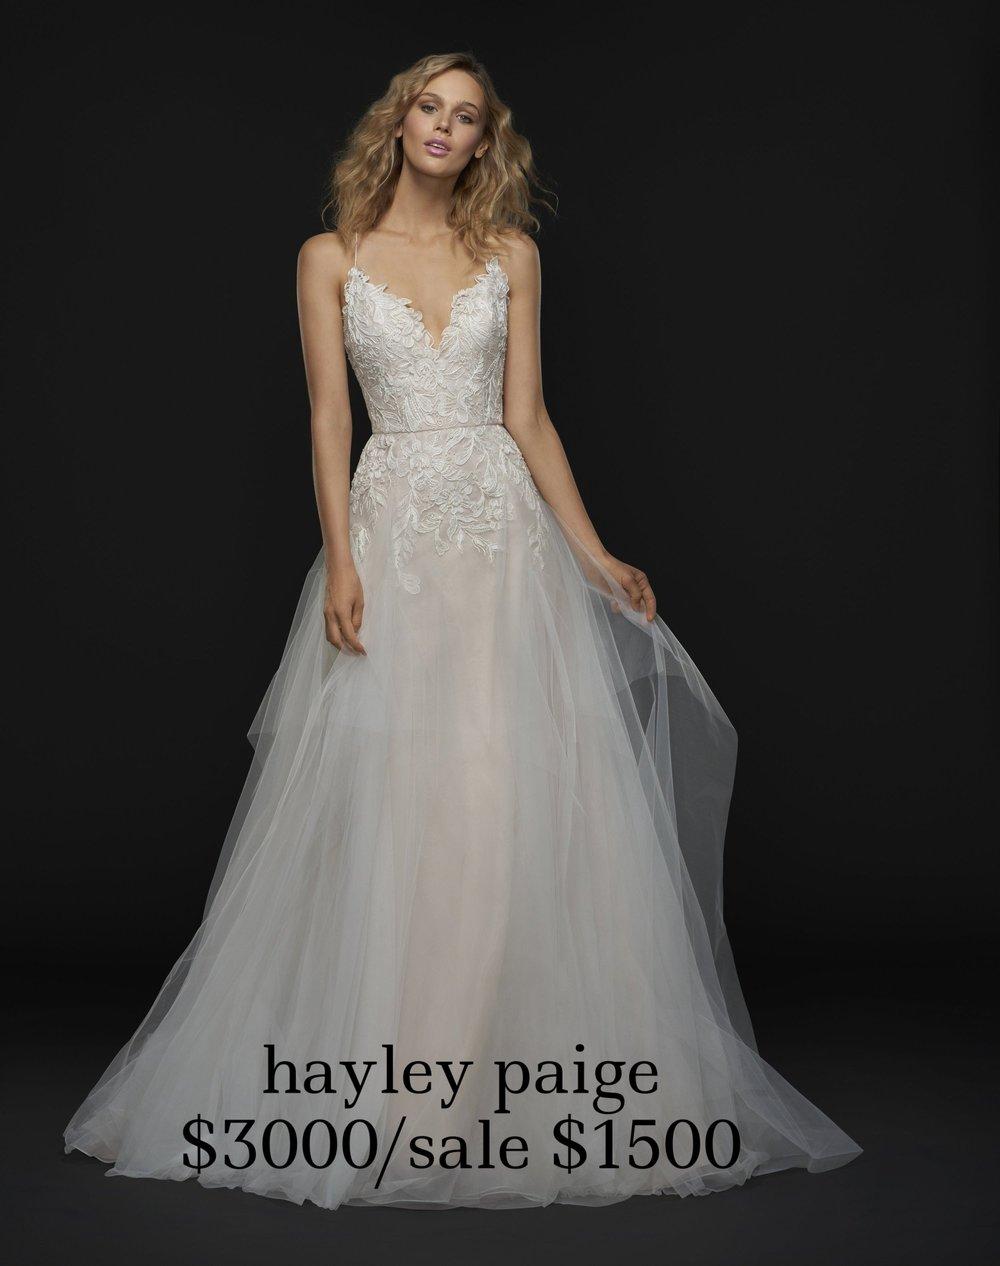 Hayley Paige Gambia OG 3000 sale $1500.JPG